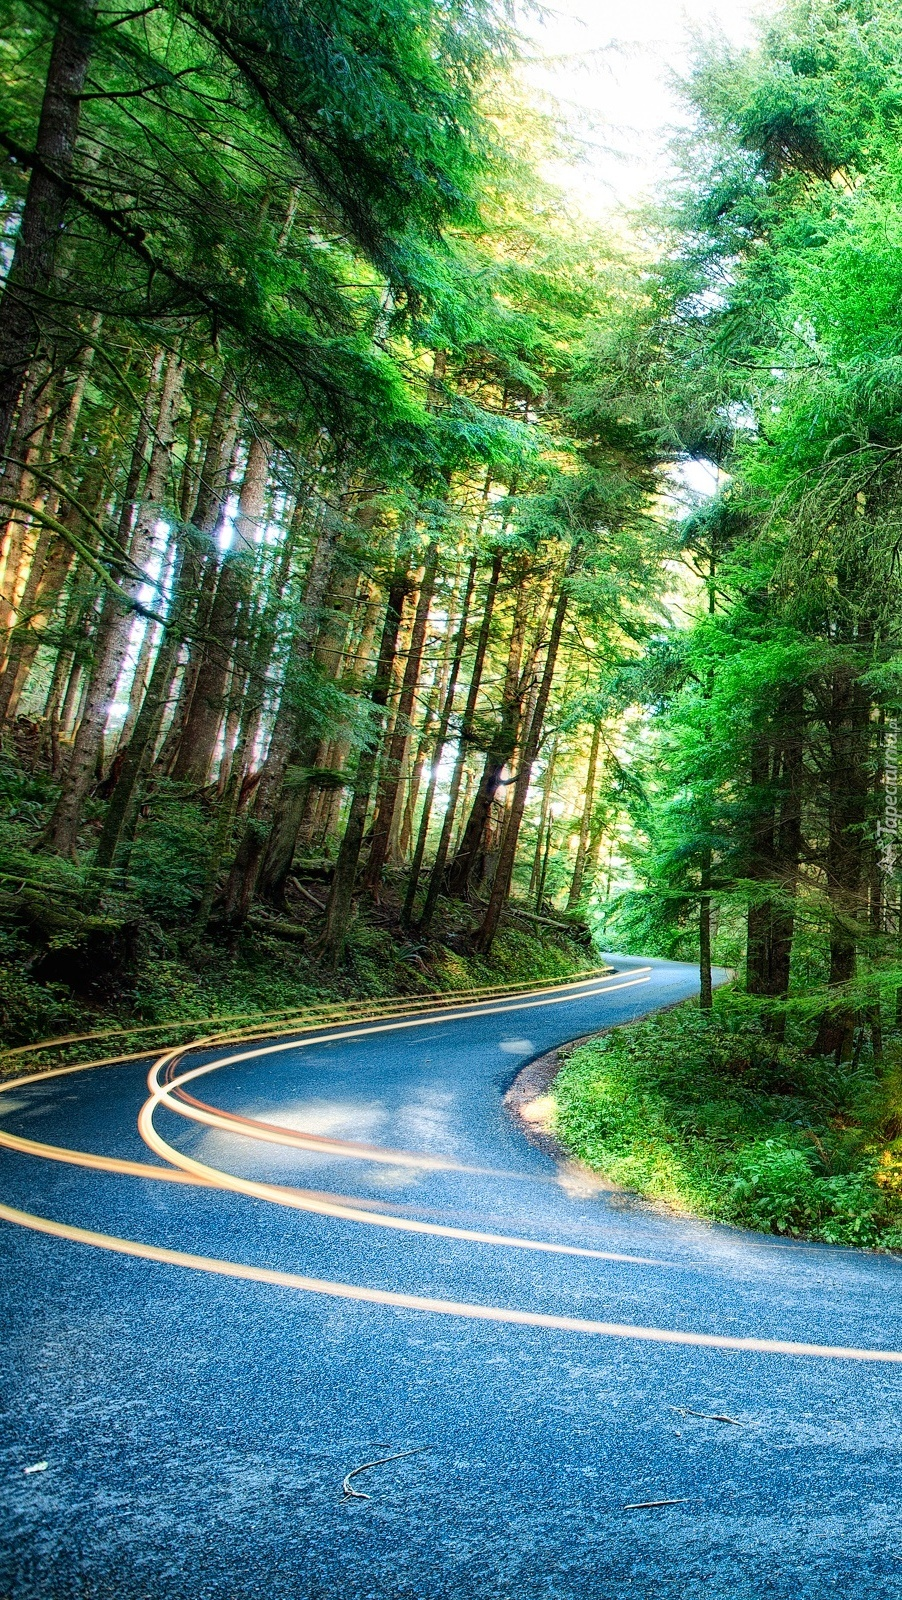 Kręta leśna droga